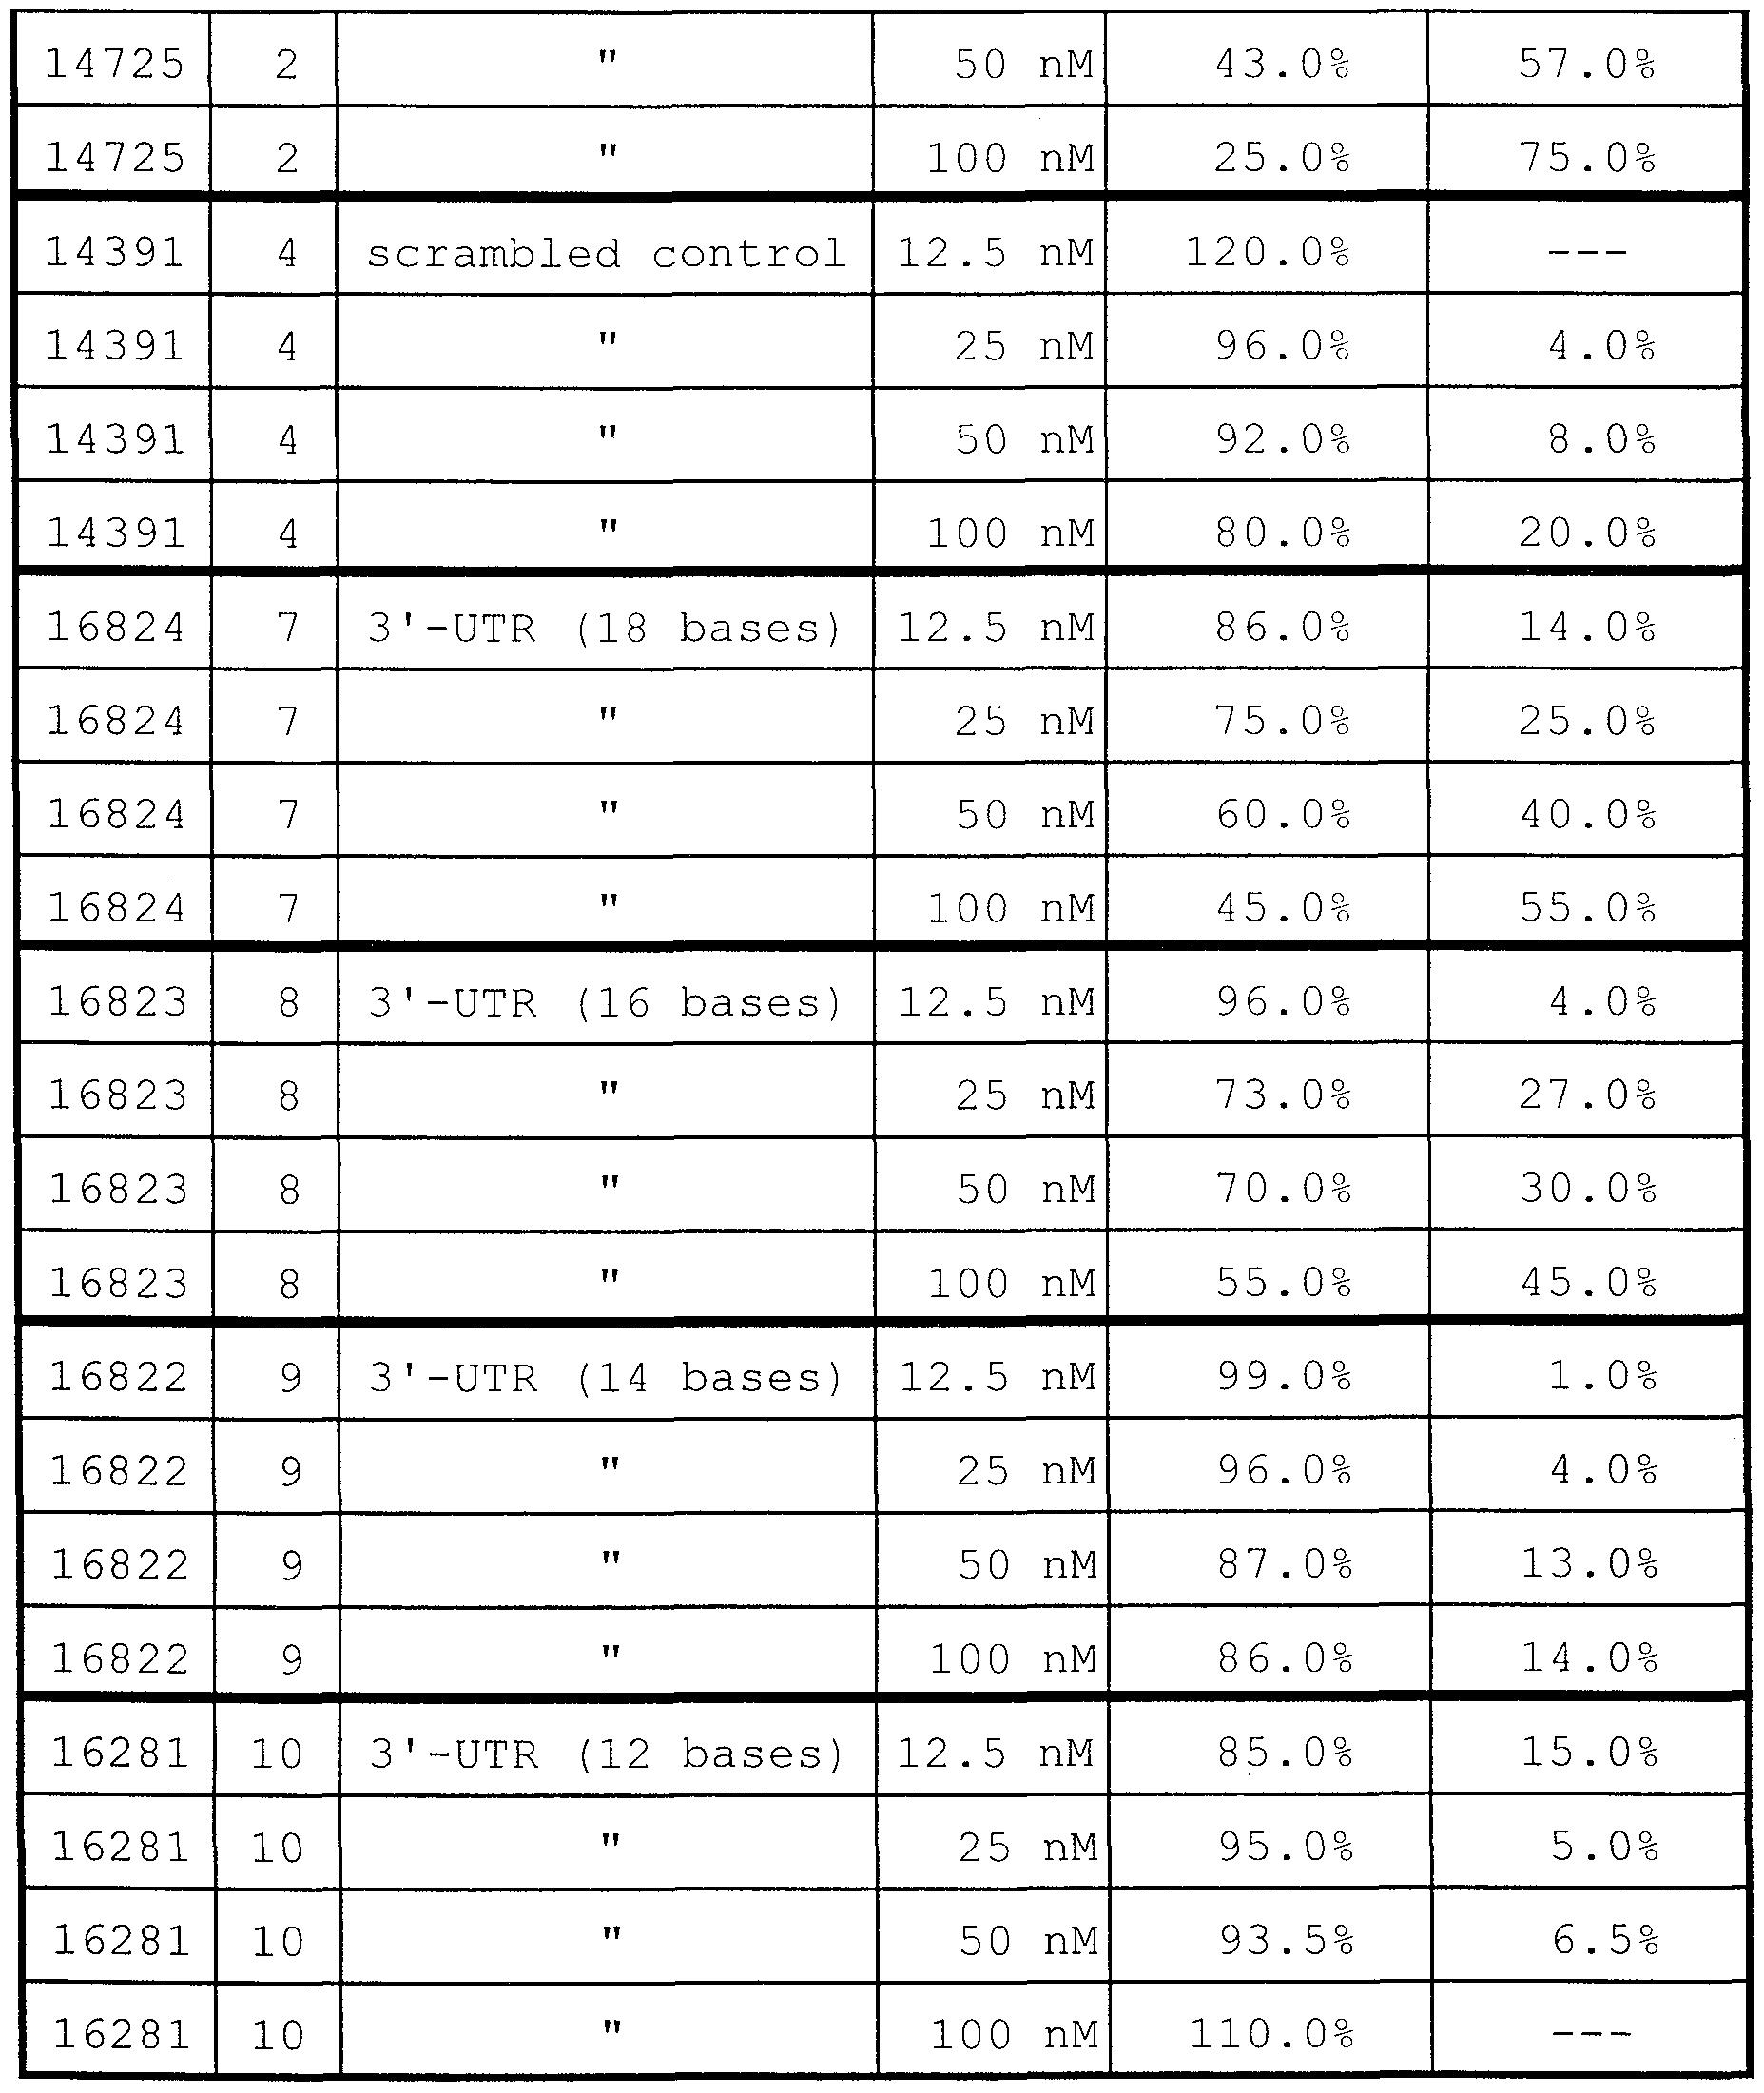 WO1999054341A1 - Enhanced antisense modulation of icam-1 - Google